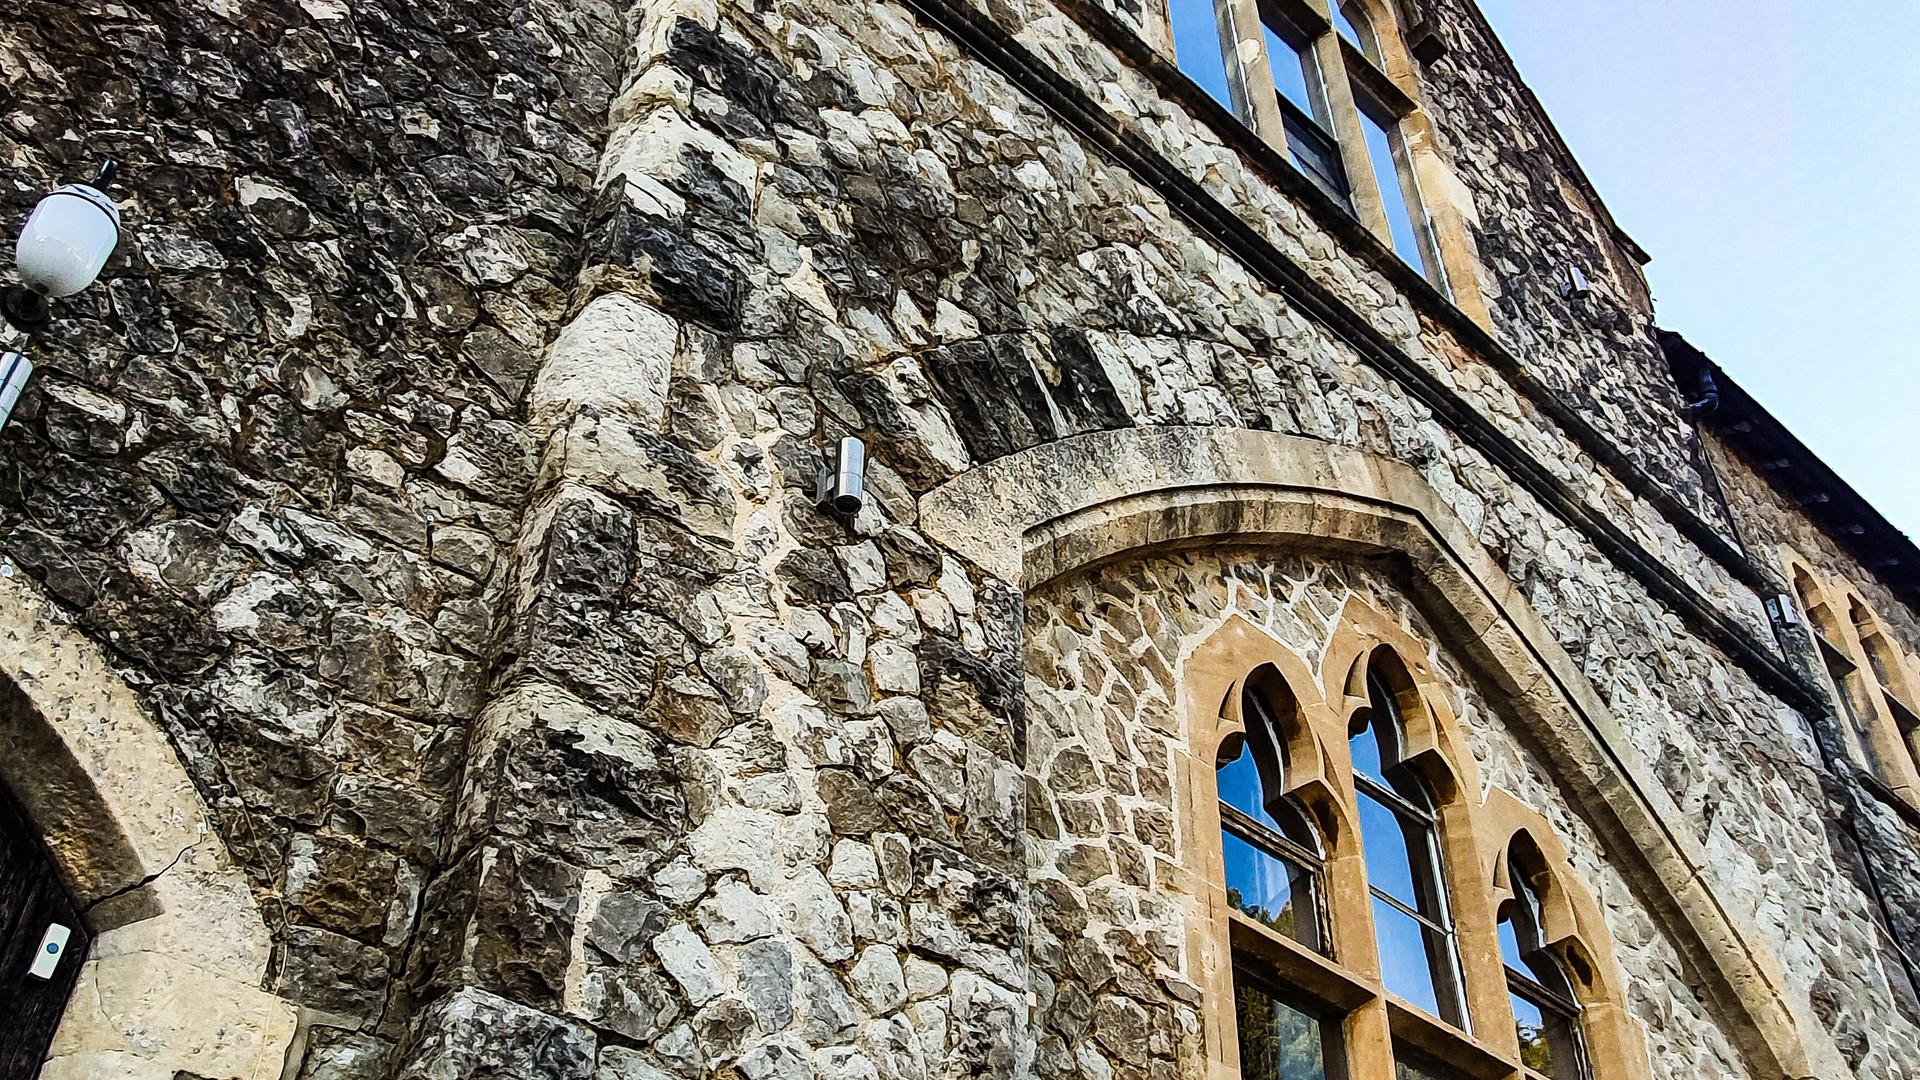 ragstone wall and windows.jpg